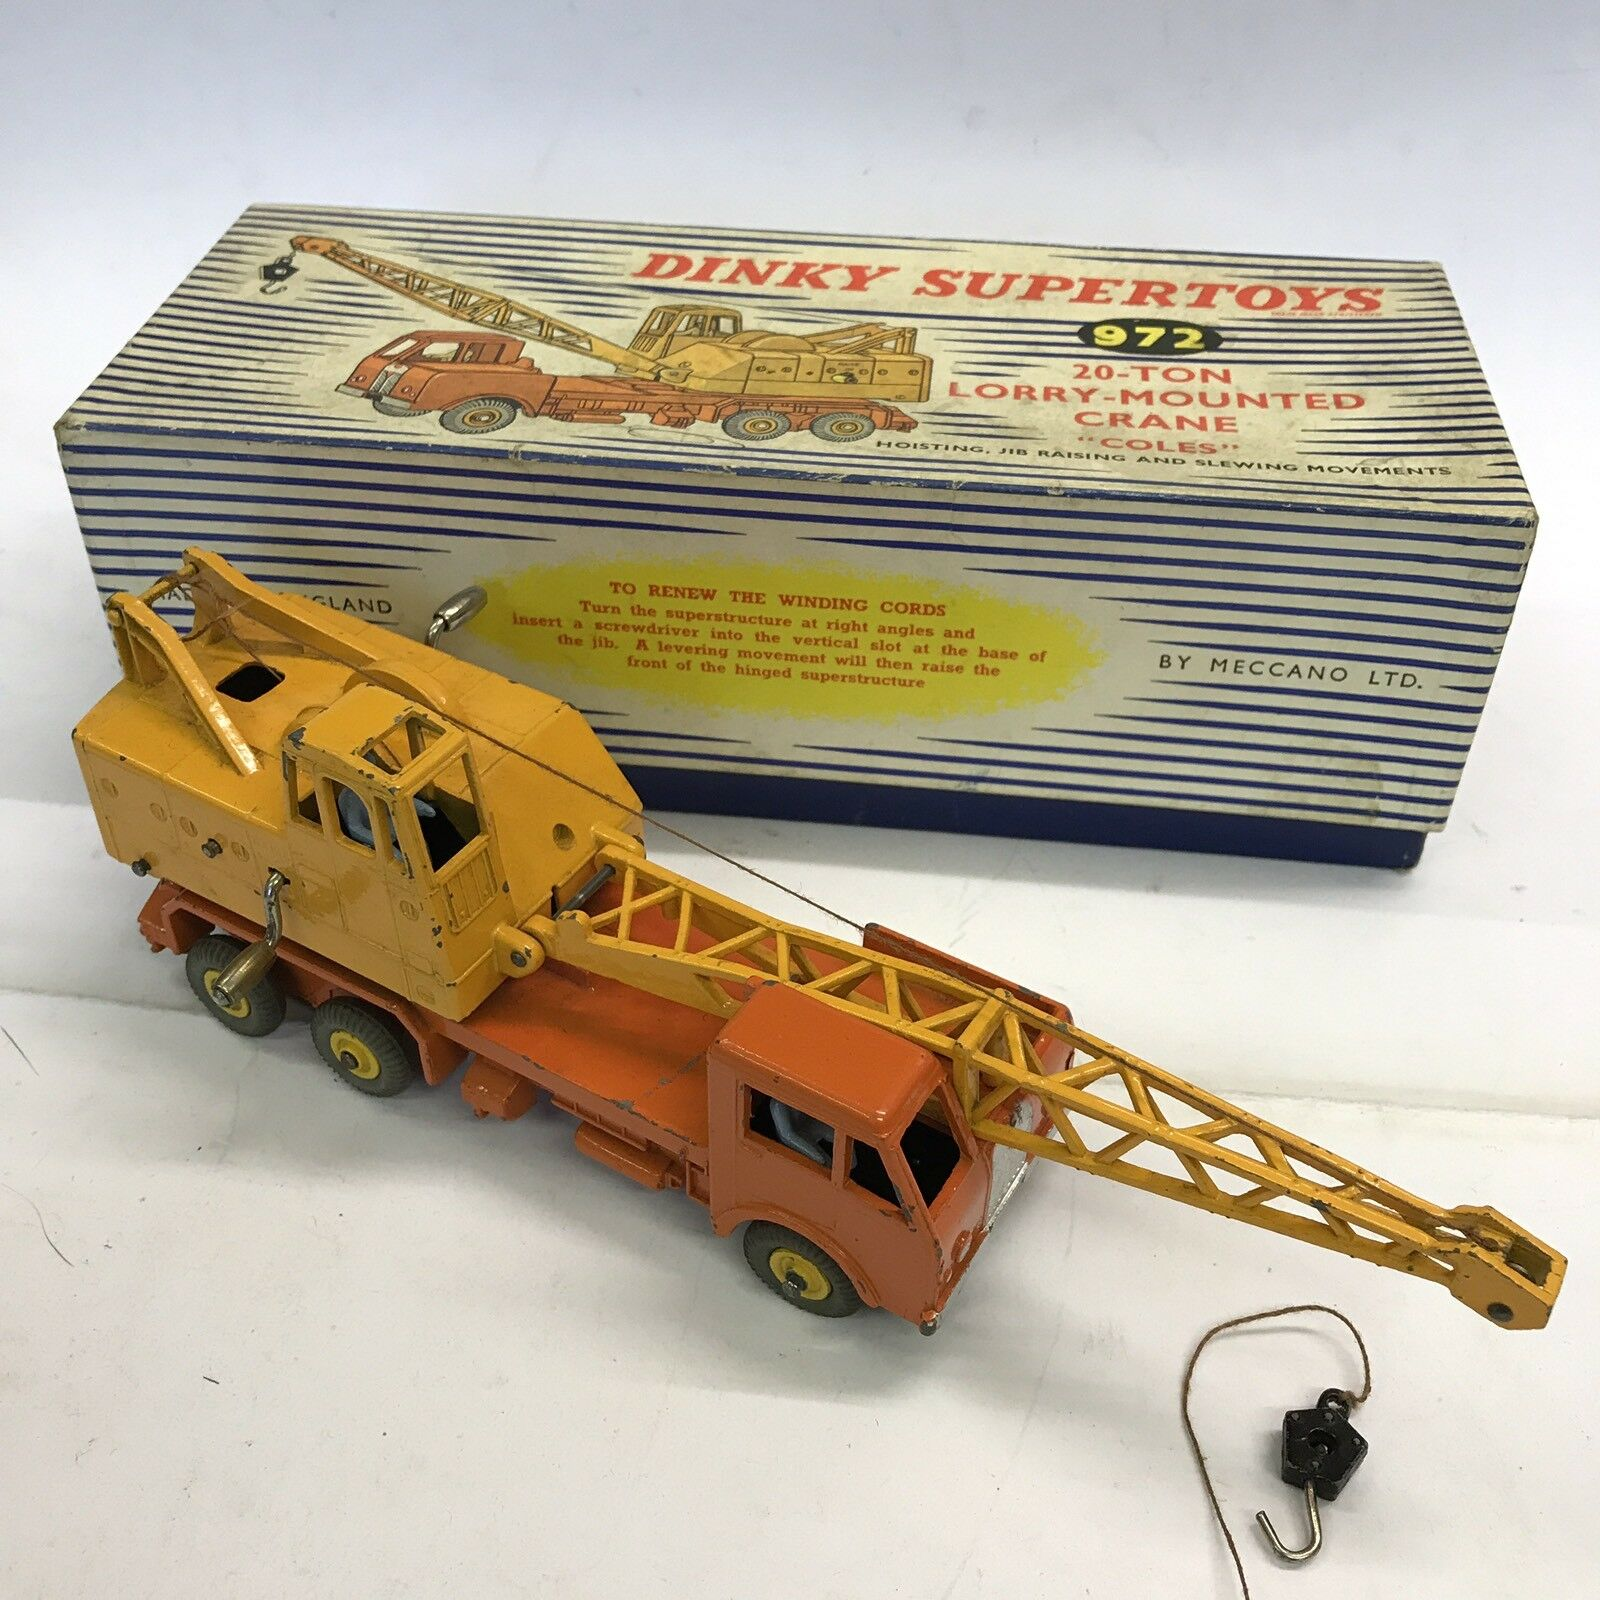 Vintage Dinky Supertoys Supertoys 20 Ton Lorry Mounted Crane Crane Coles No. 972 Boxed